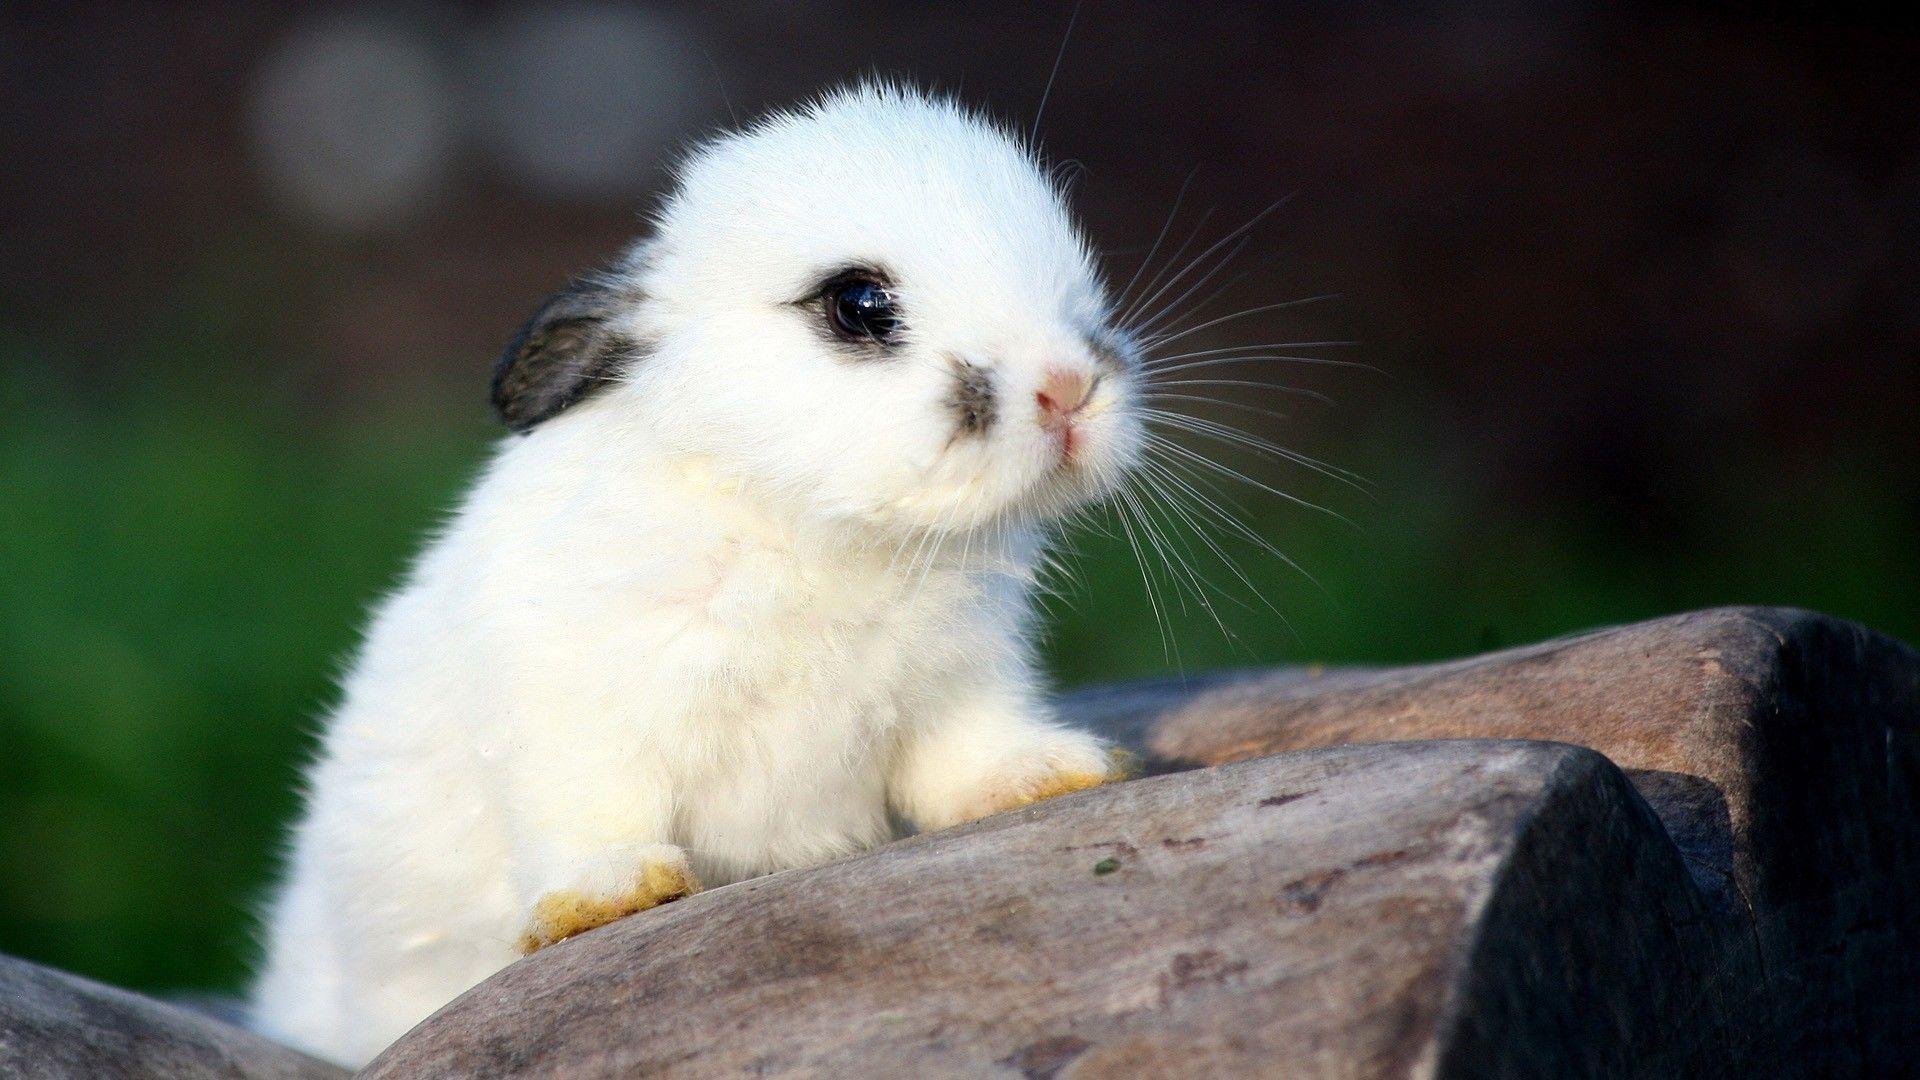 Wallpapers For > Cute Baby Animal Wallpapers Desktop